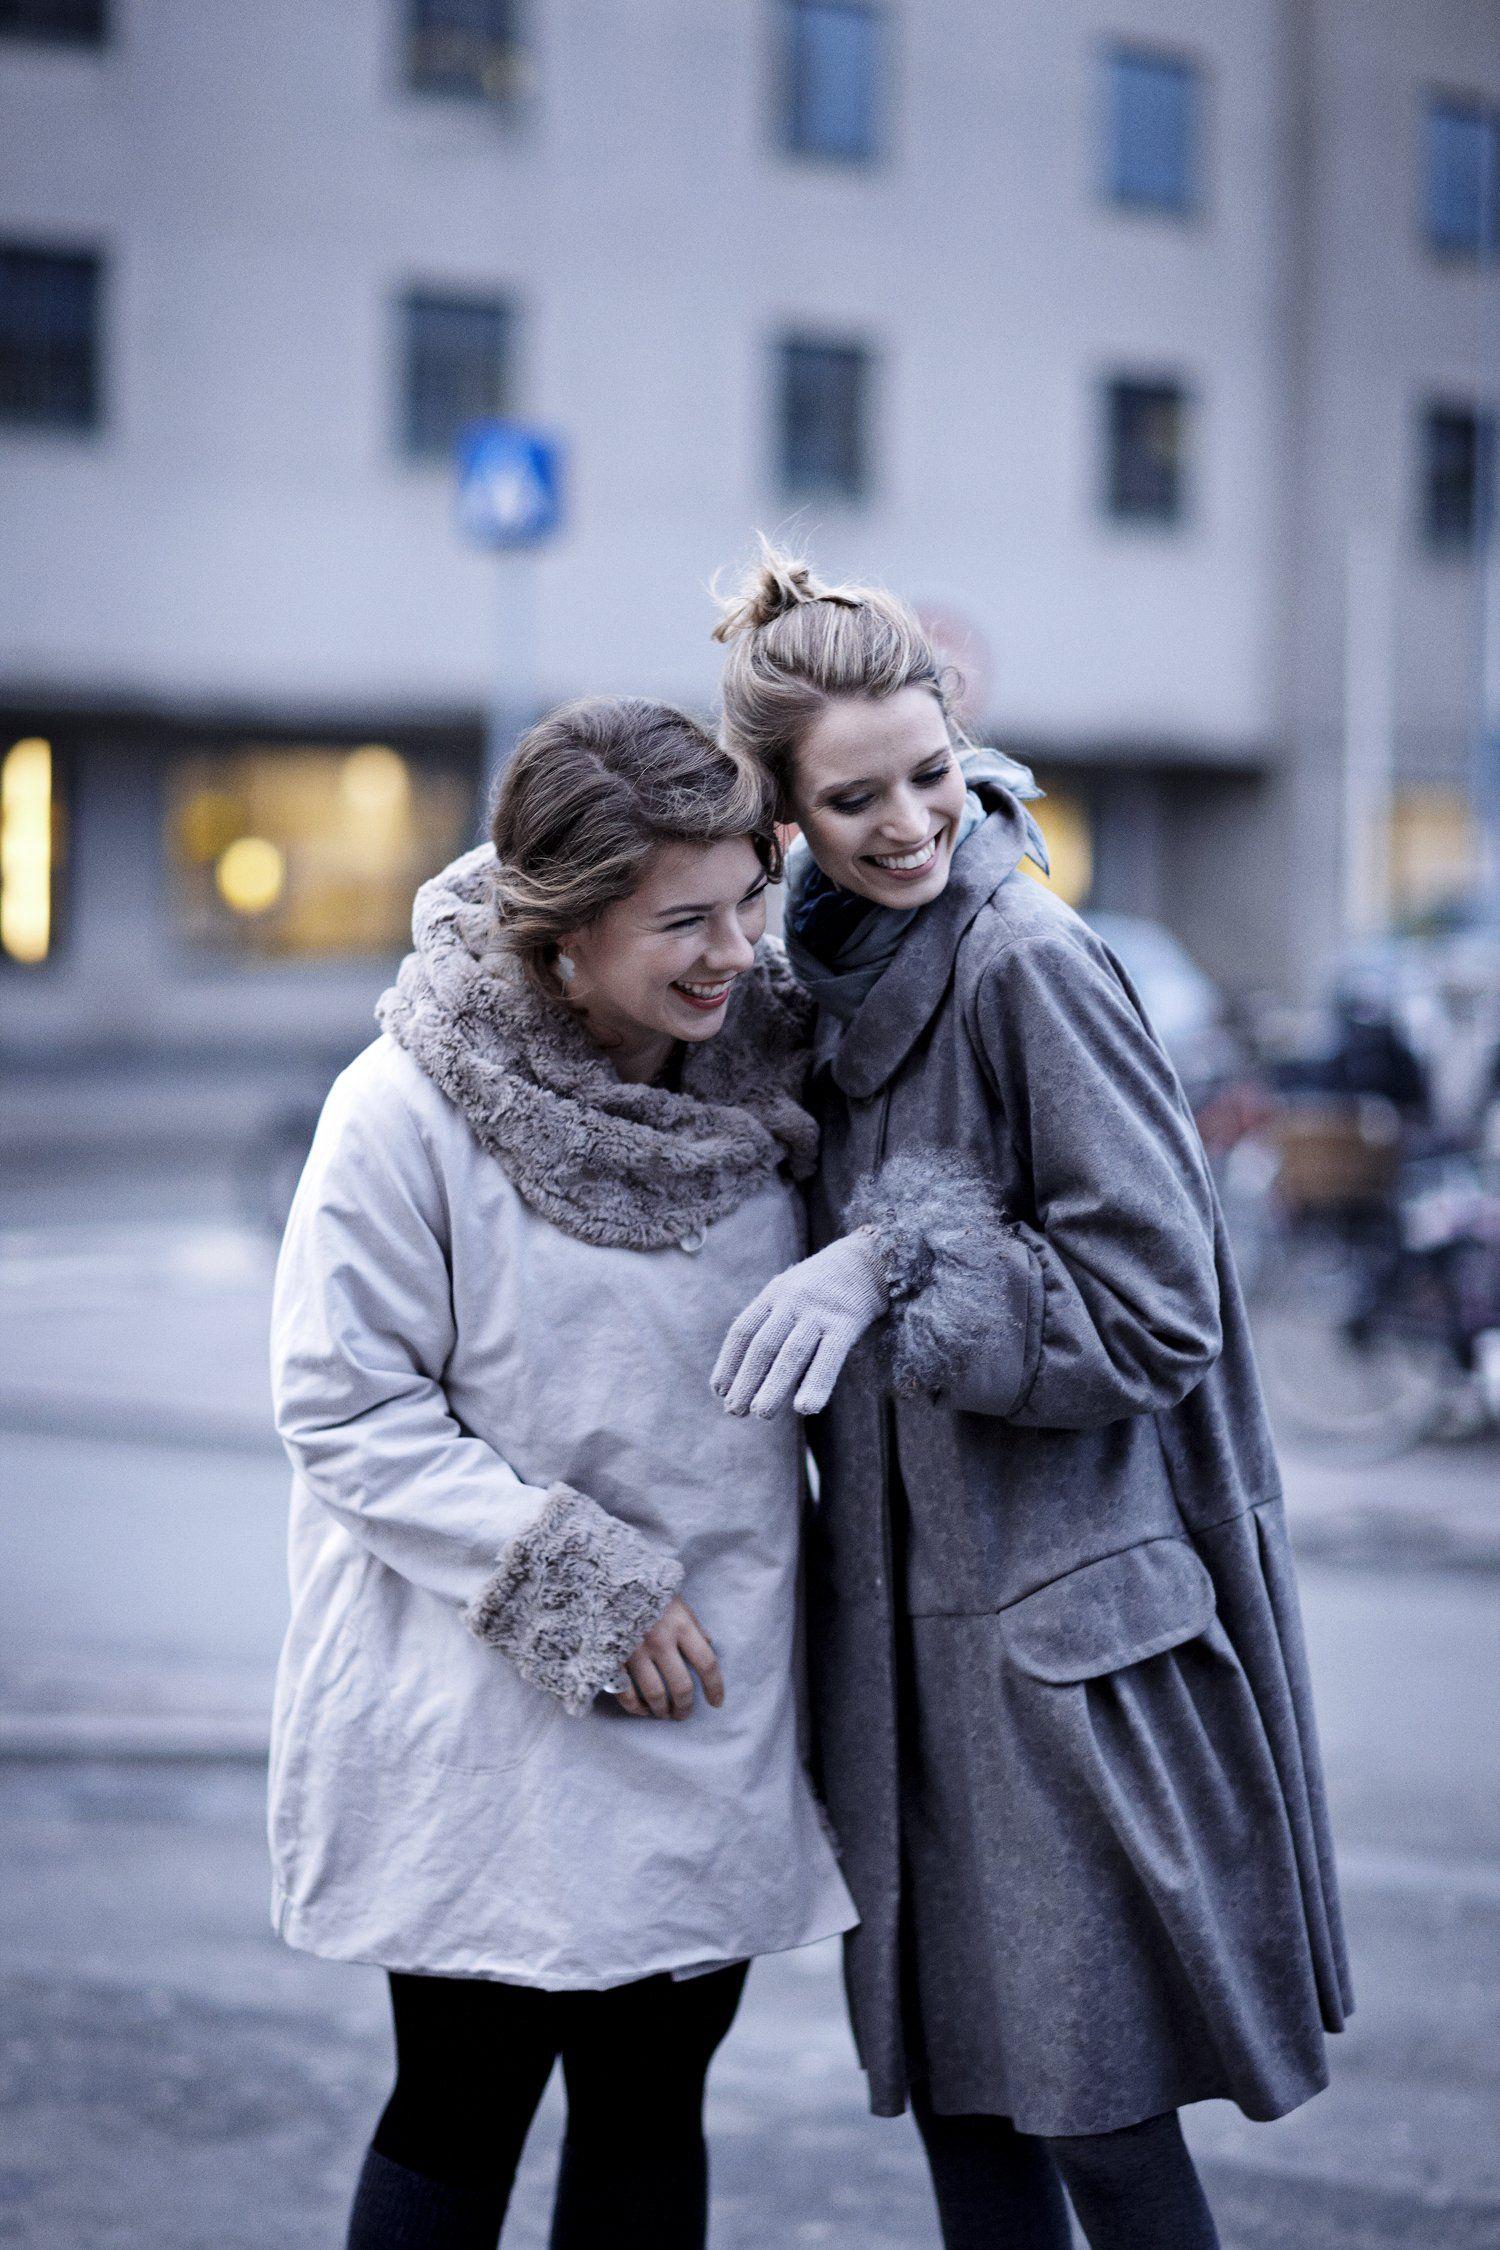 stunning mcverdi coats shop now #0: 06c549d263ae3d fde